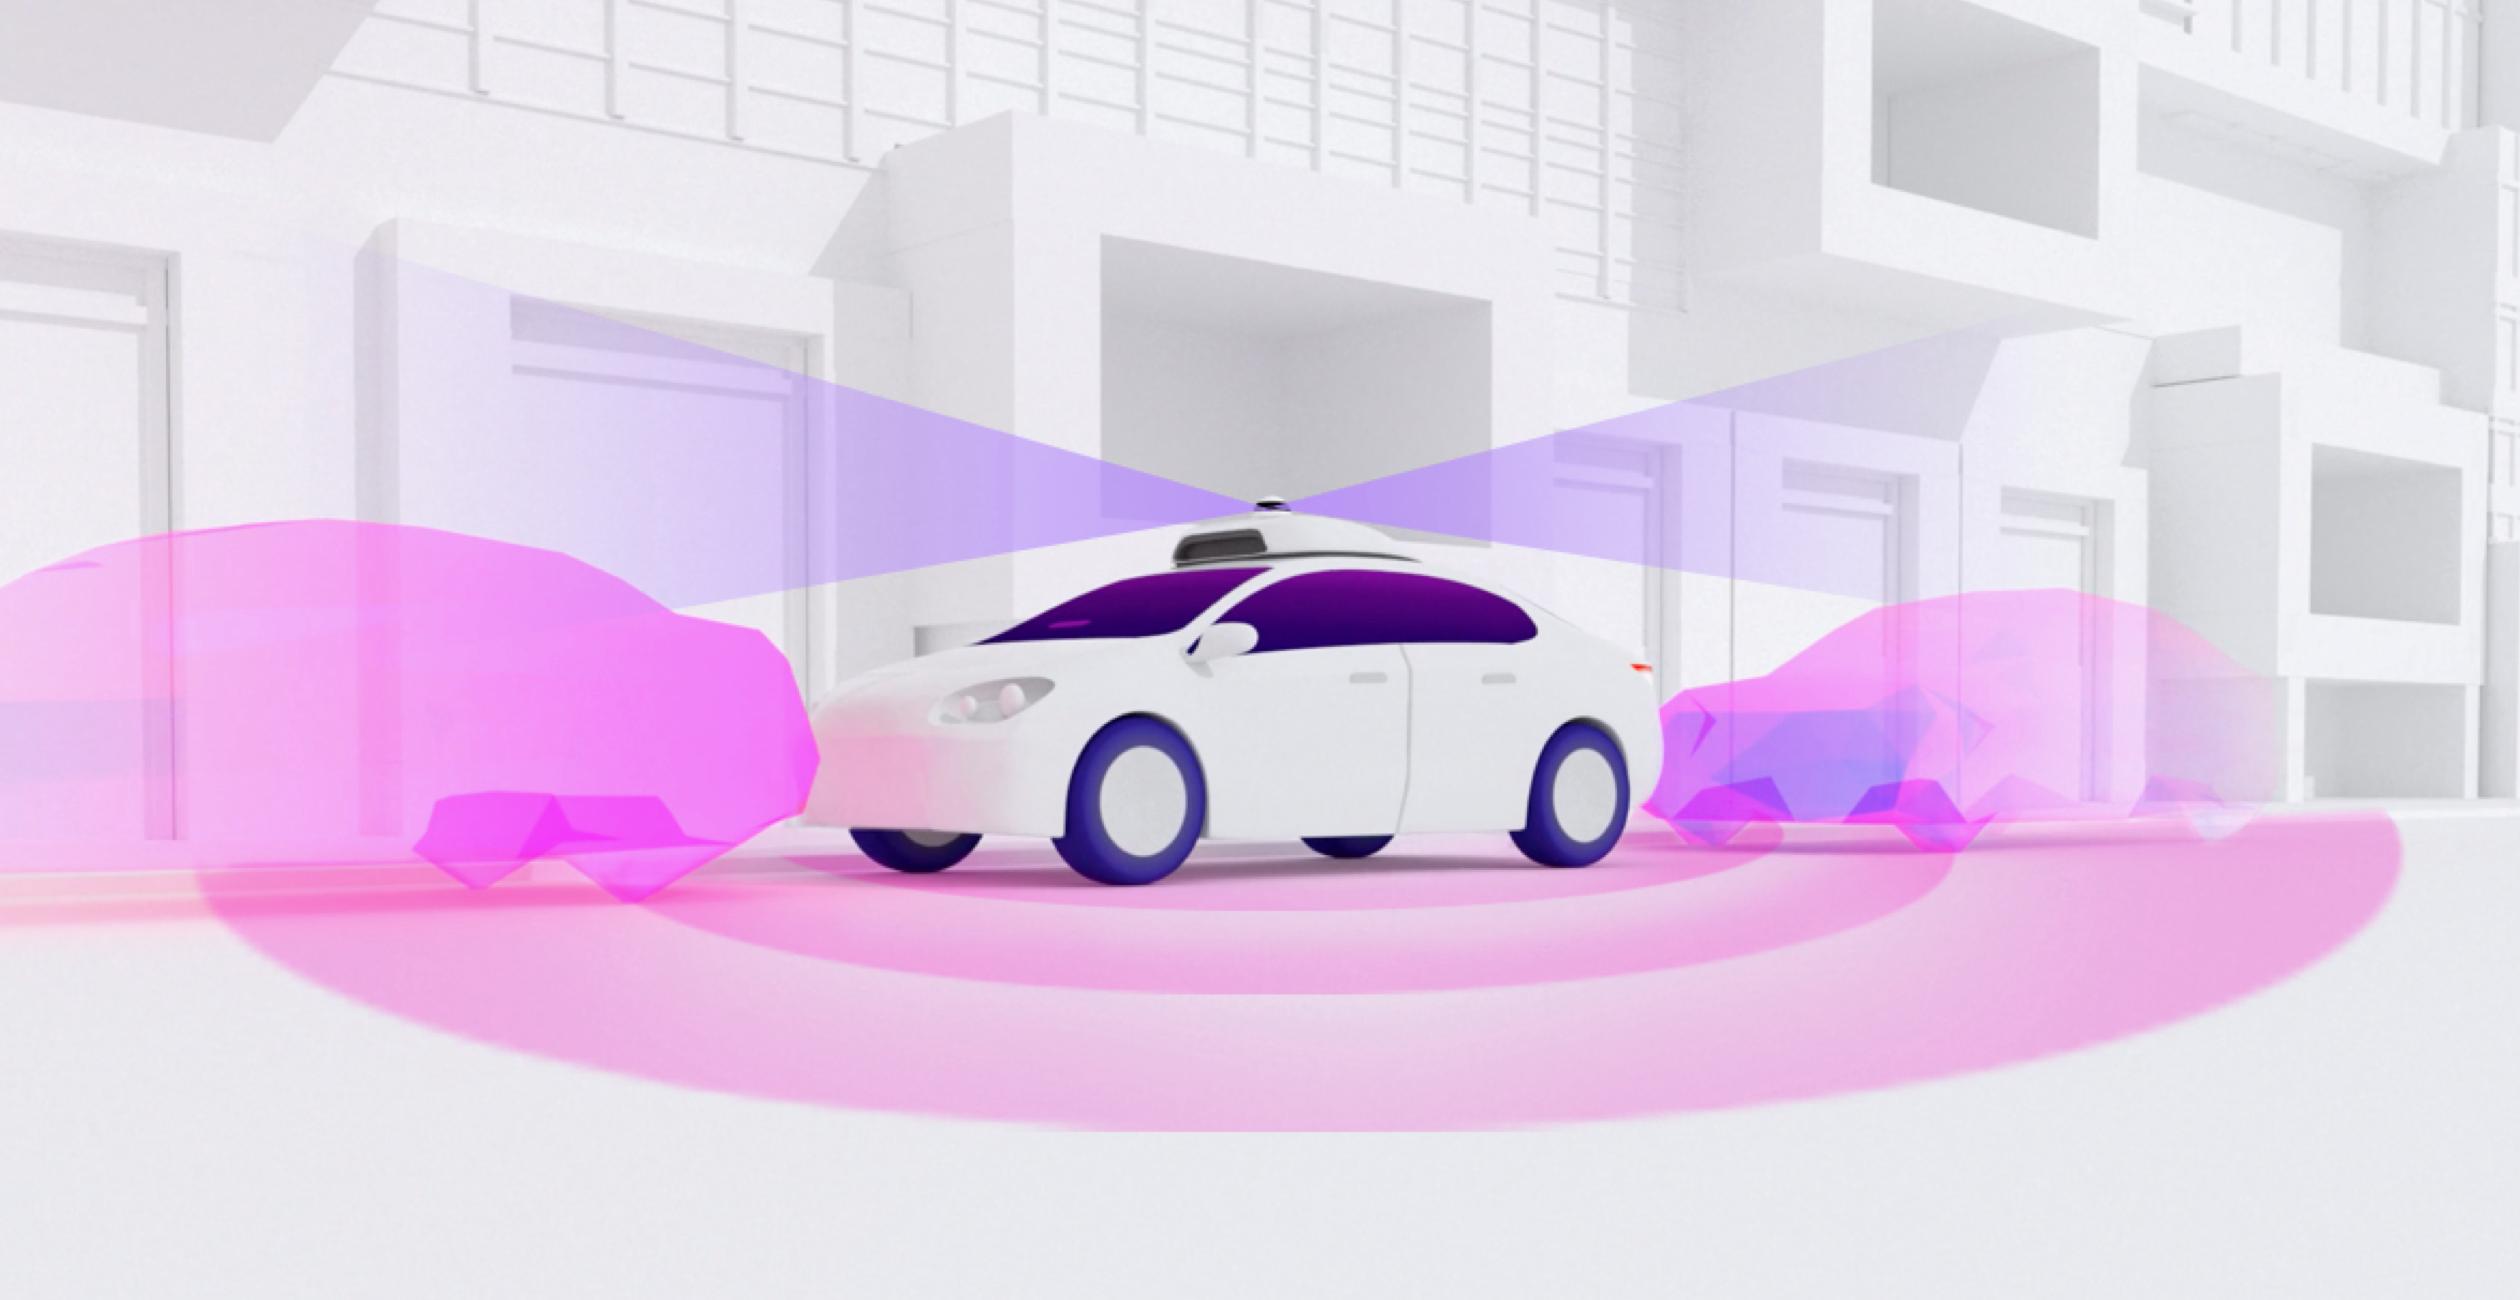 Self driving Lyft vehicle with camera 360 degree camera sensor